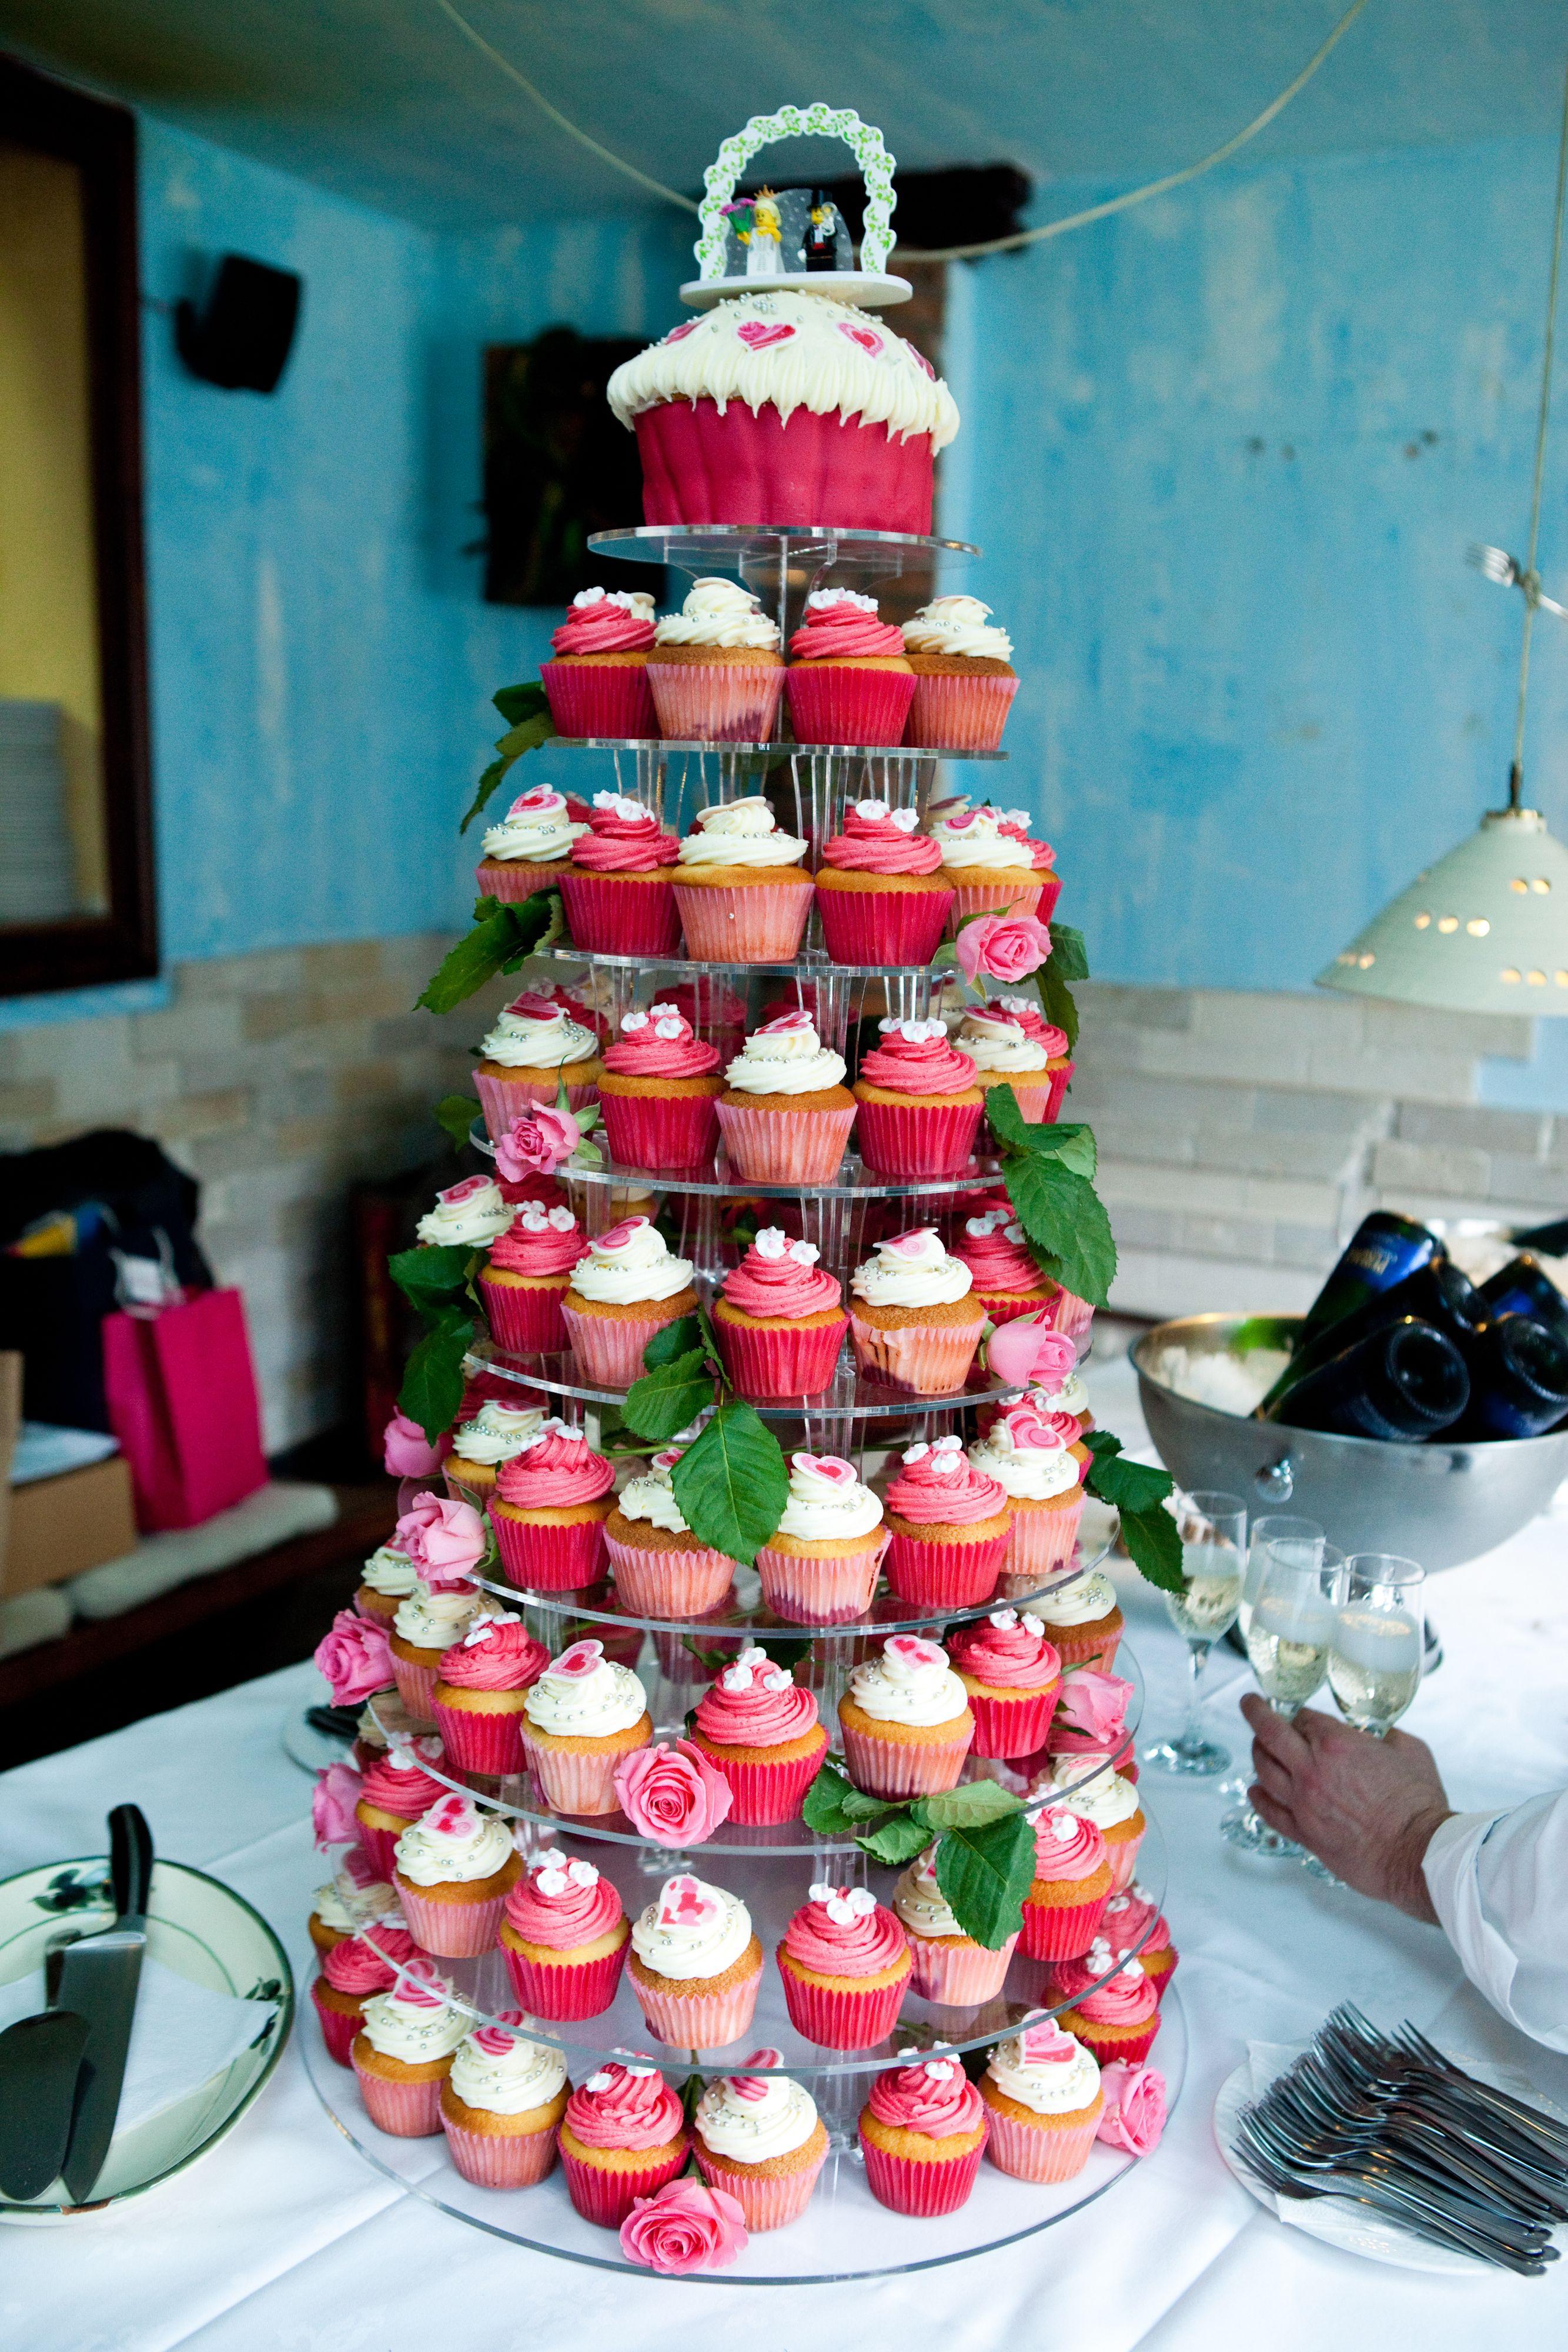 A cupcake tower for a spring wedding ten to three weddings